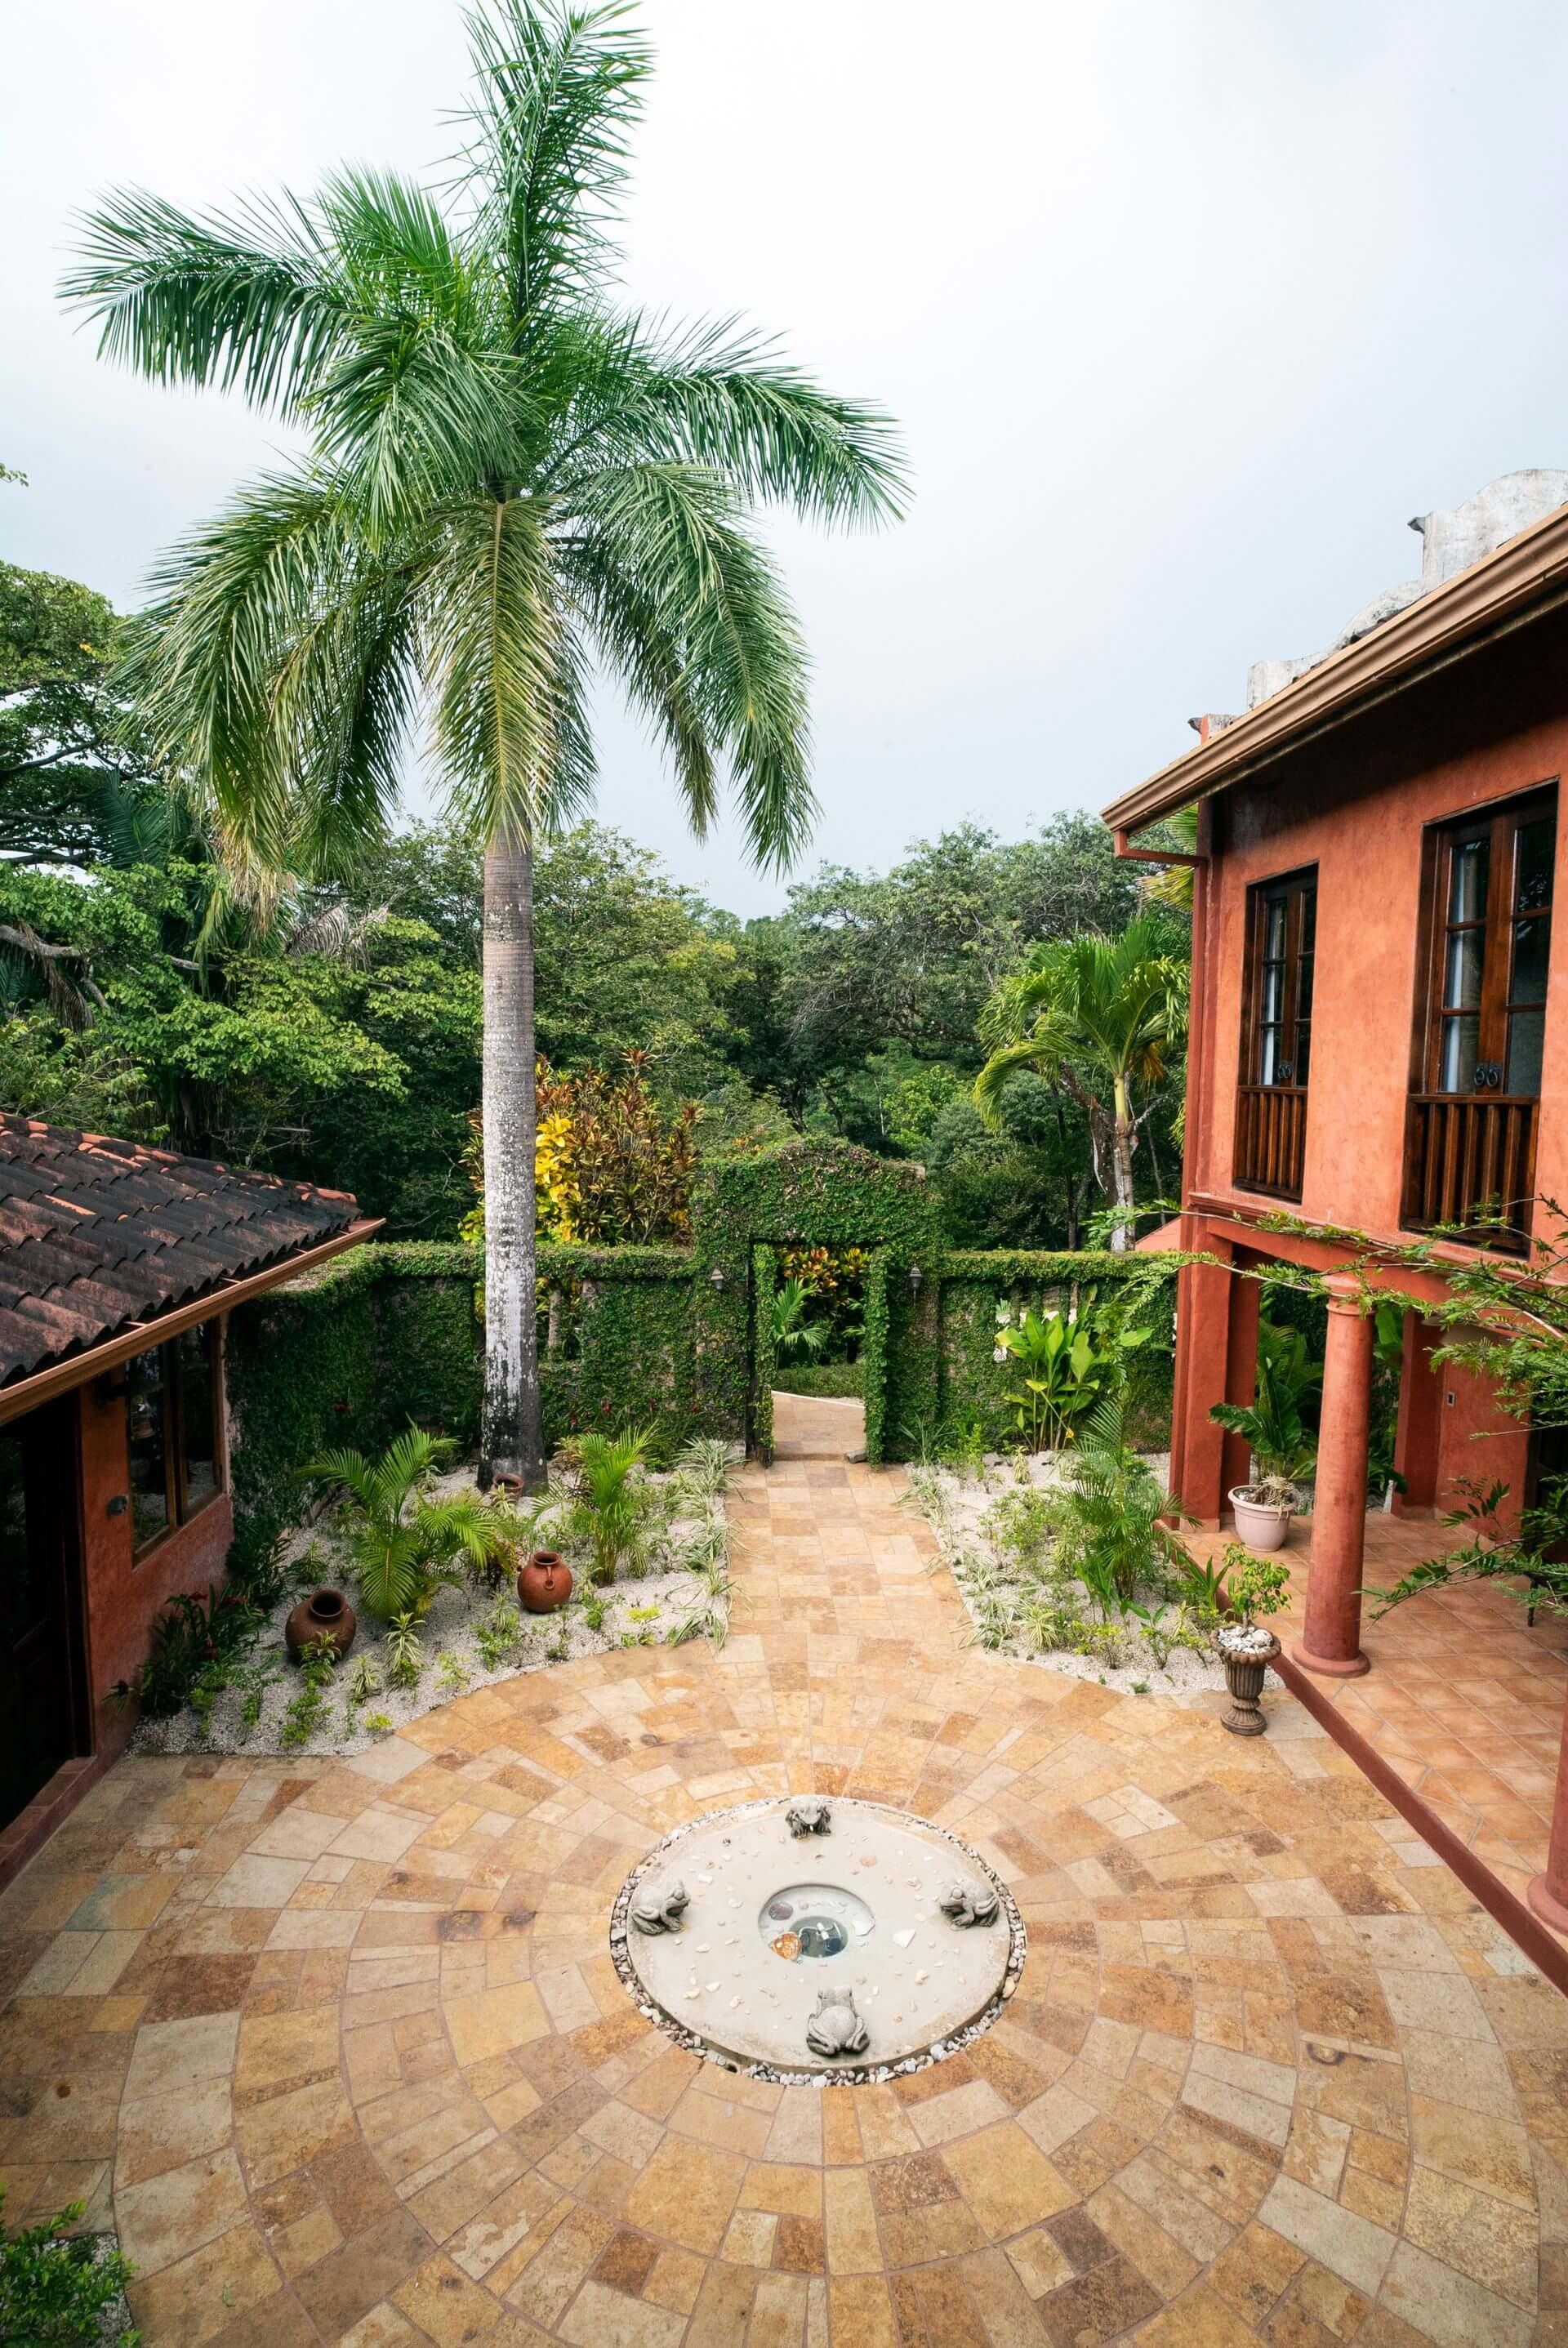 Barrigona Villa Guanacaste View